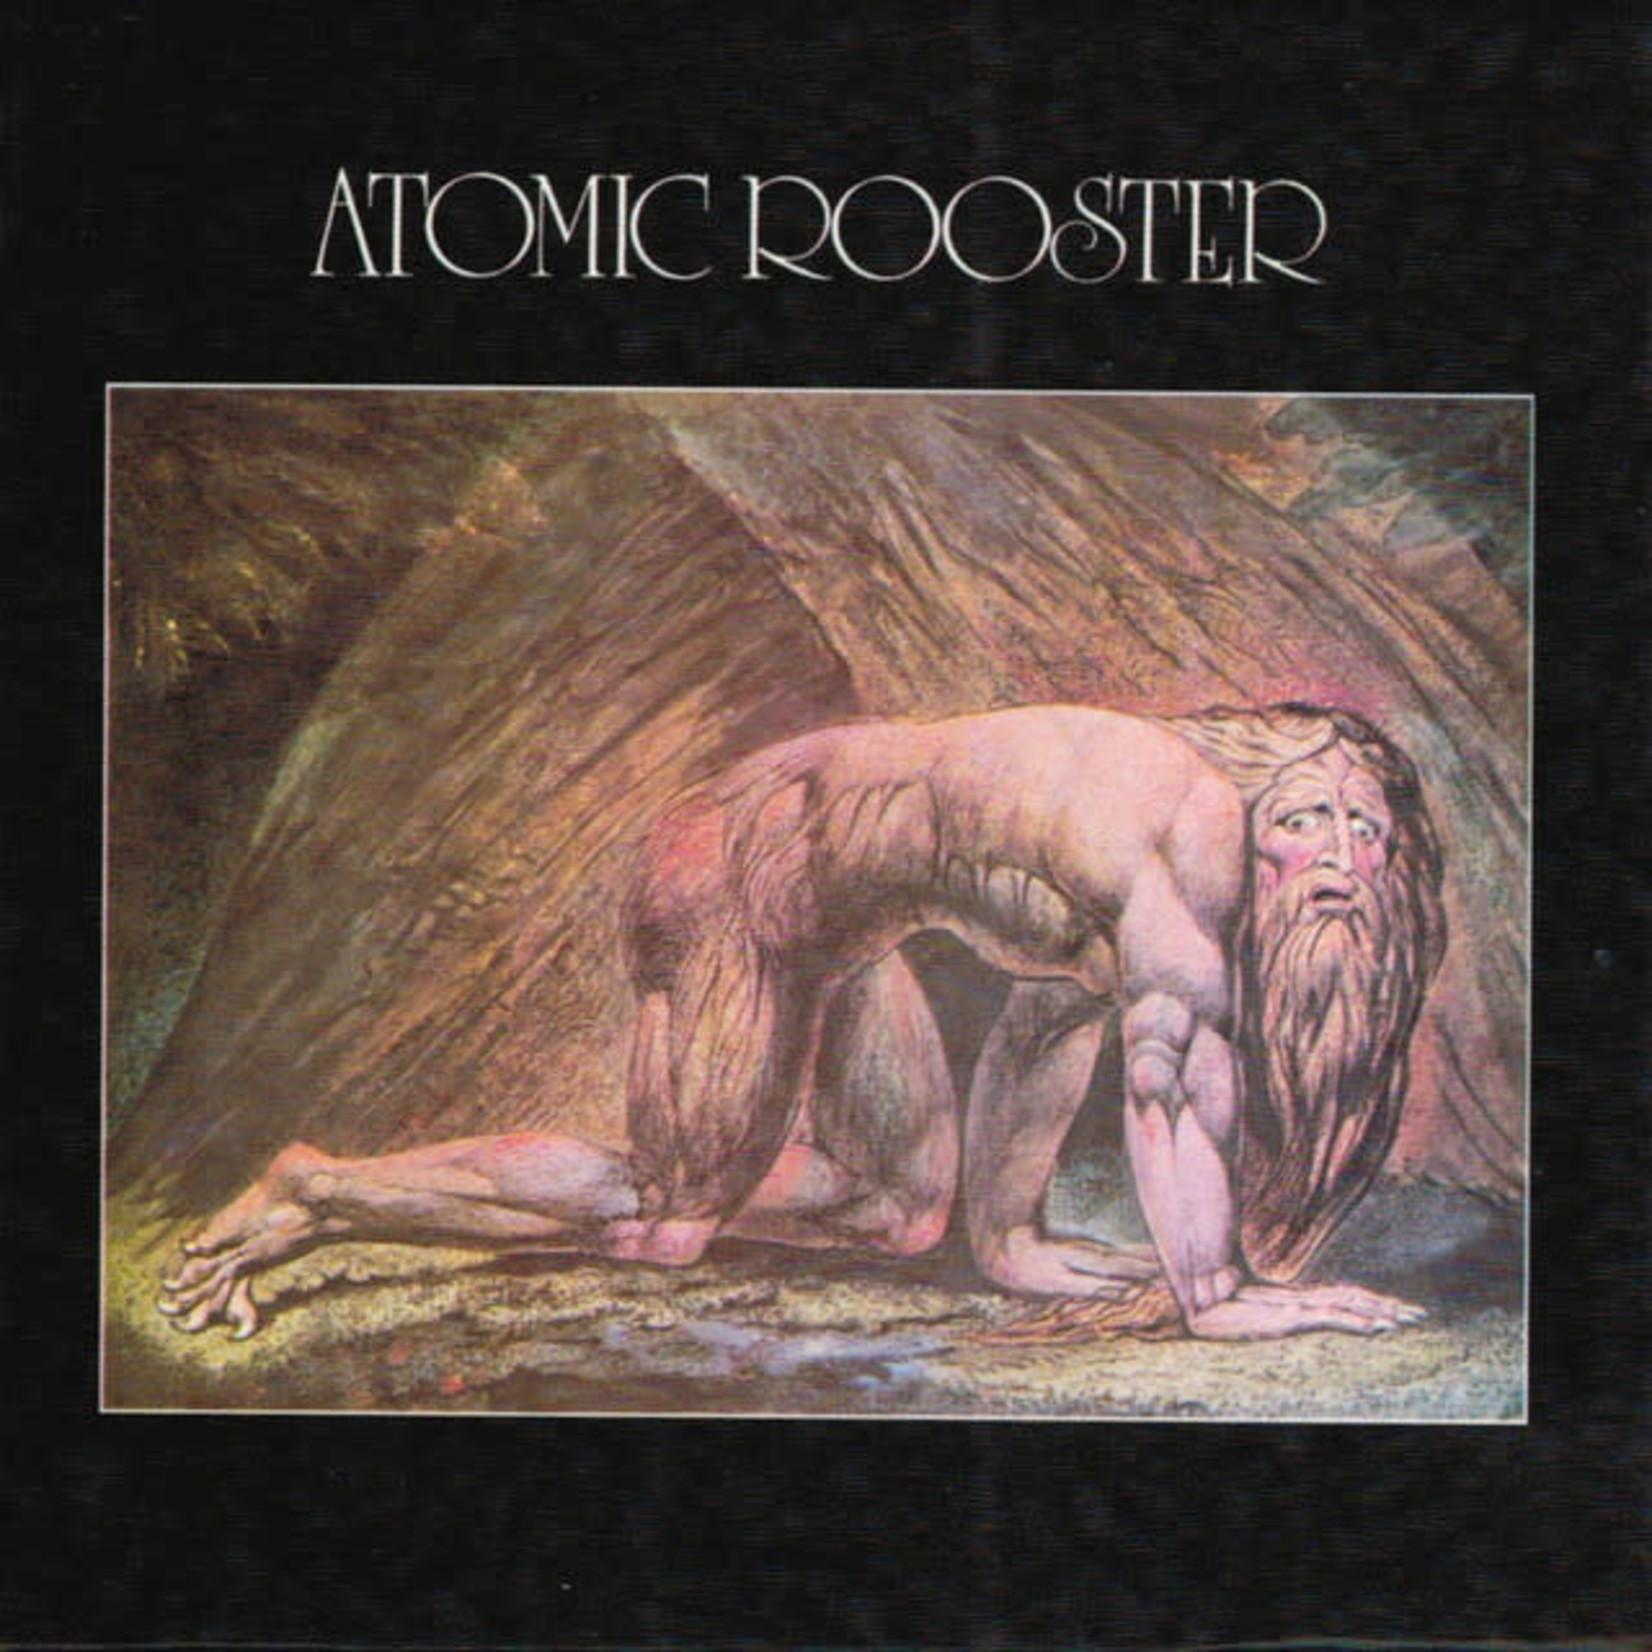 Vinyl Atomic Rooster - Death Walks Behind You  $$